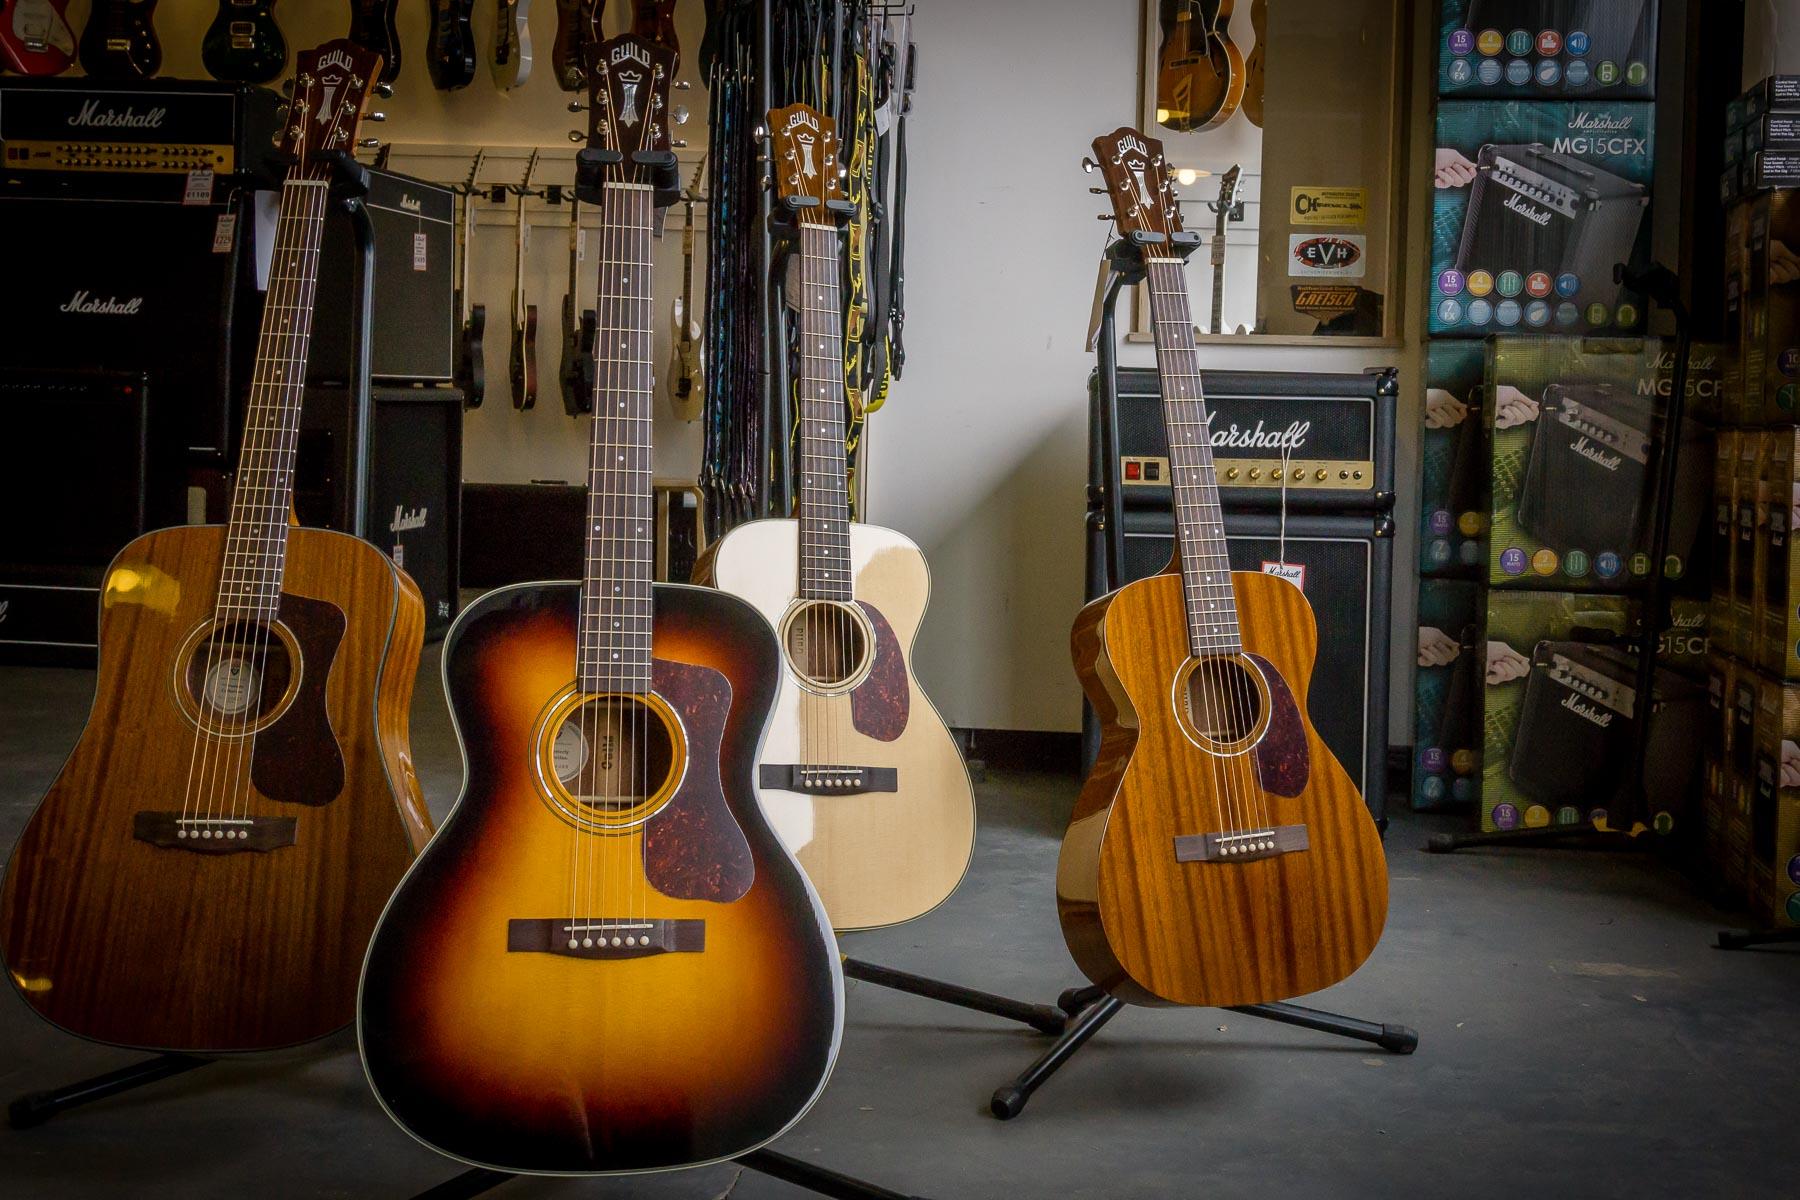 2015 Guild Westerly Series Guitars UK - Guitar.co.uk Blog